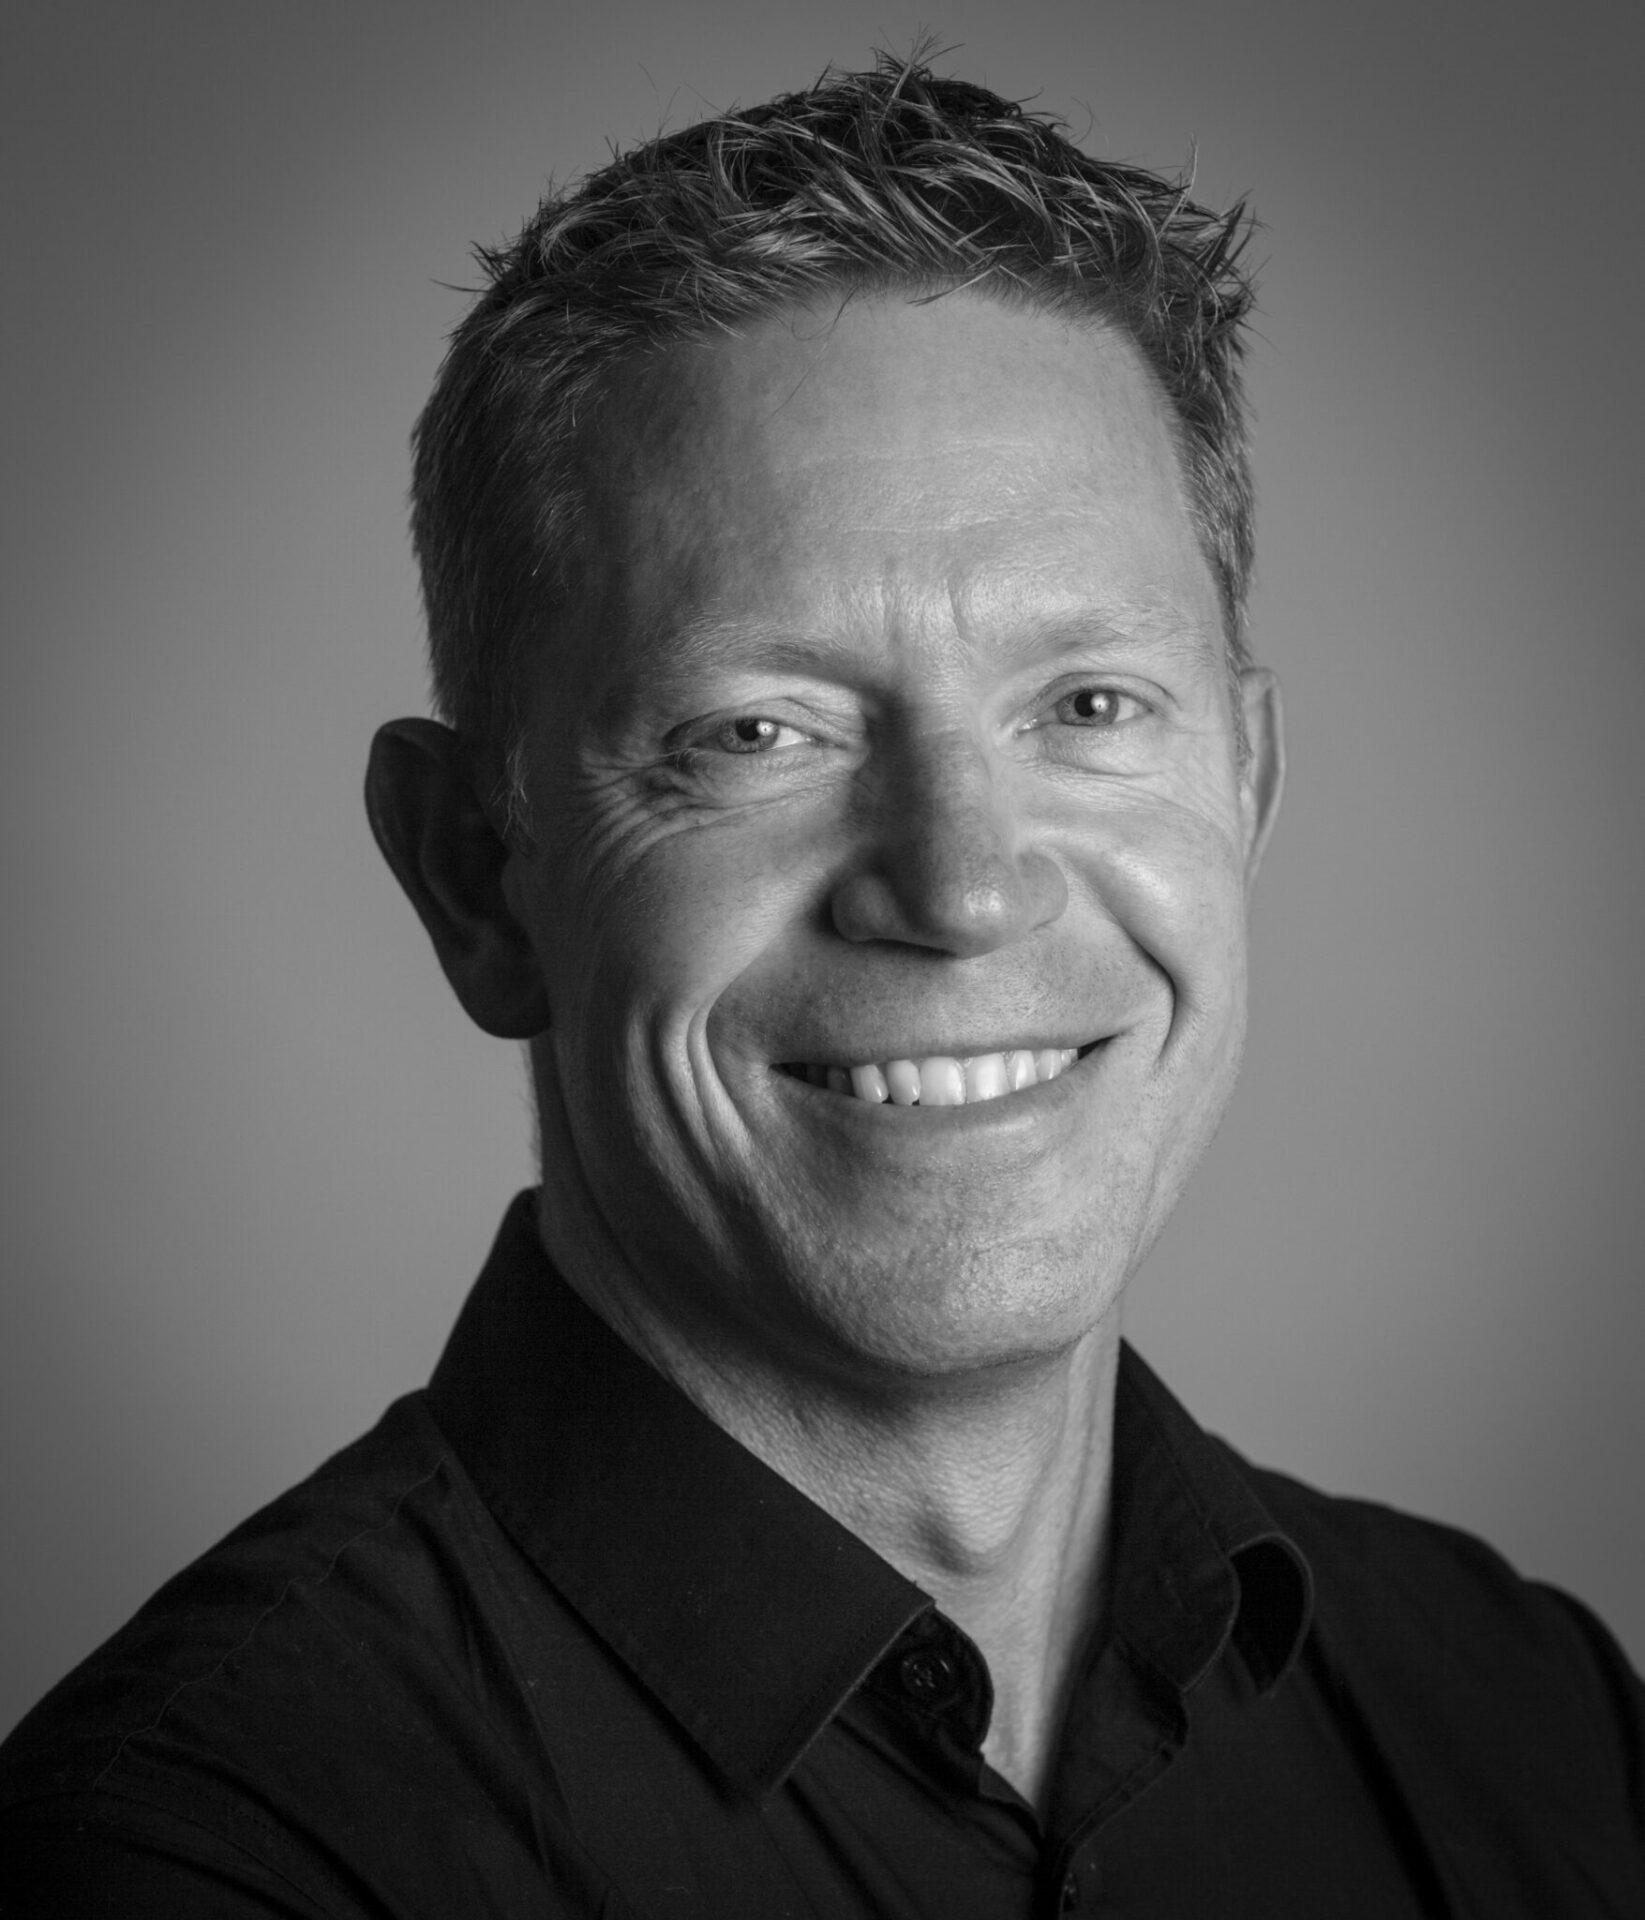 Jens Strandbygaard, Gekkobrain